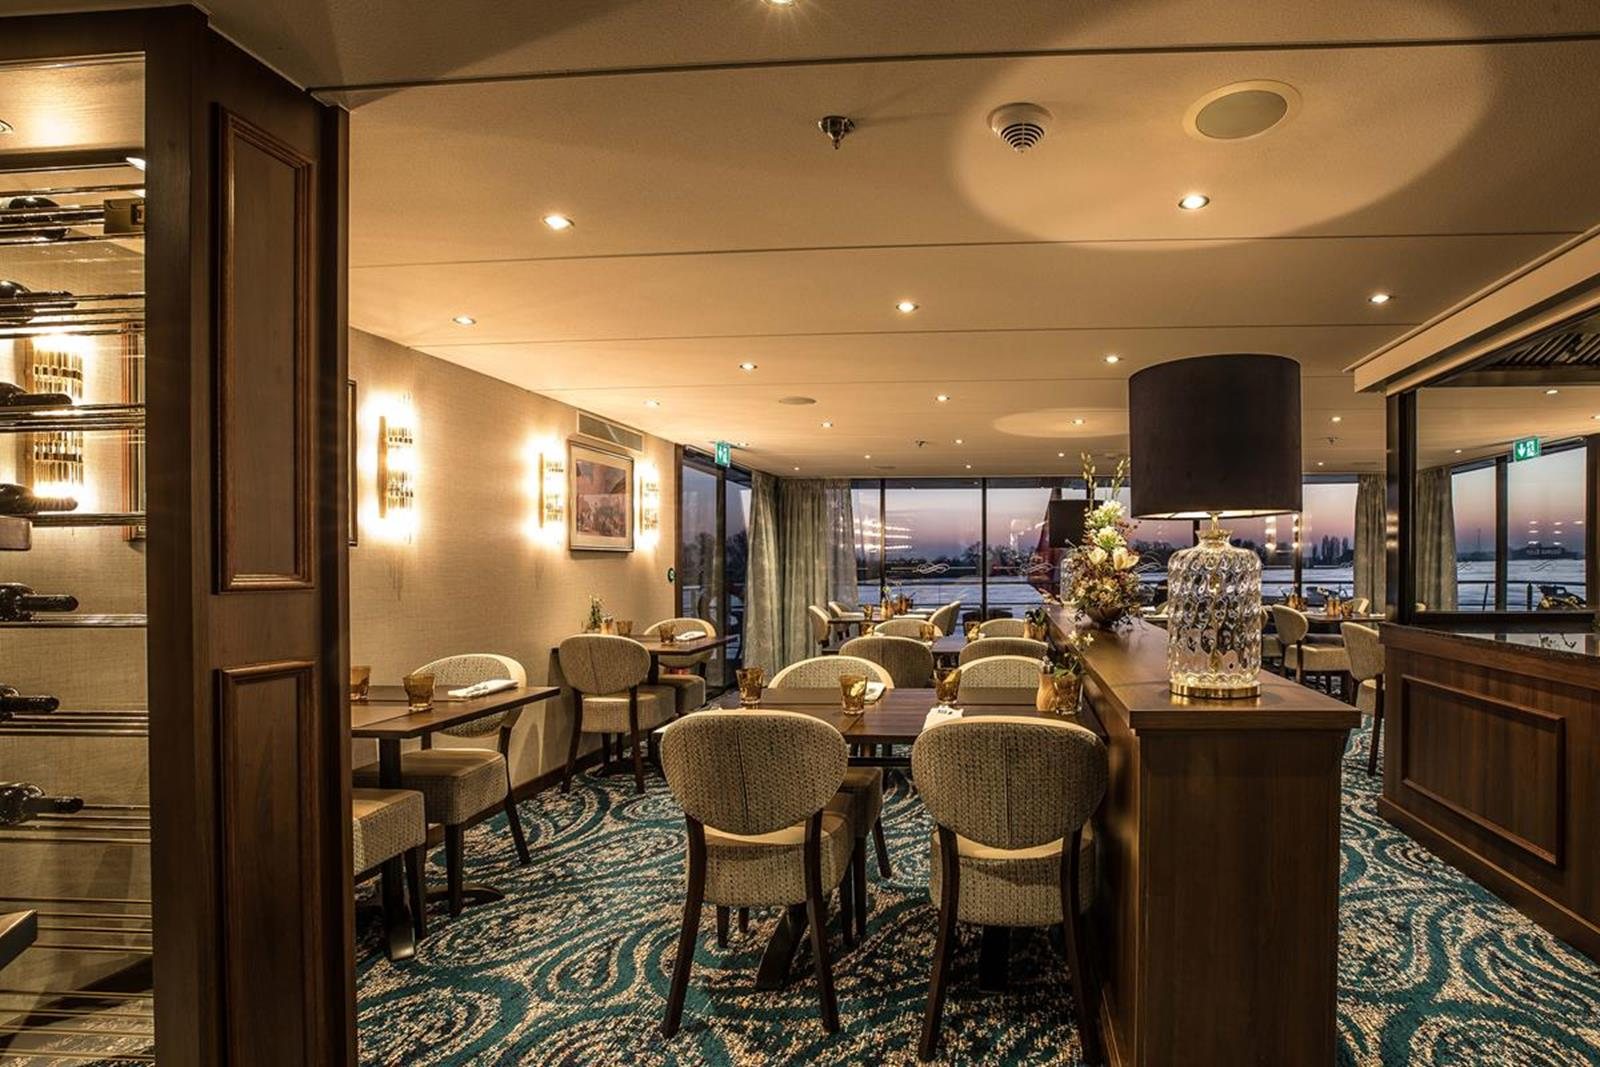 MS George Eliot bistro night 1 - Courtesy of Riviera River Cruises